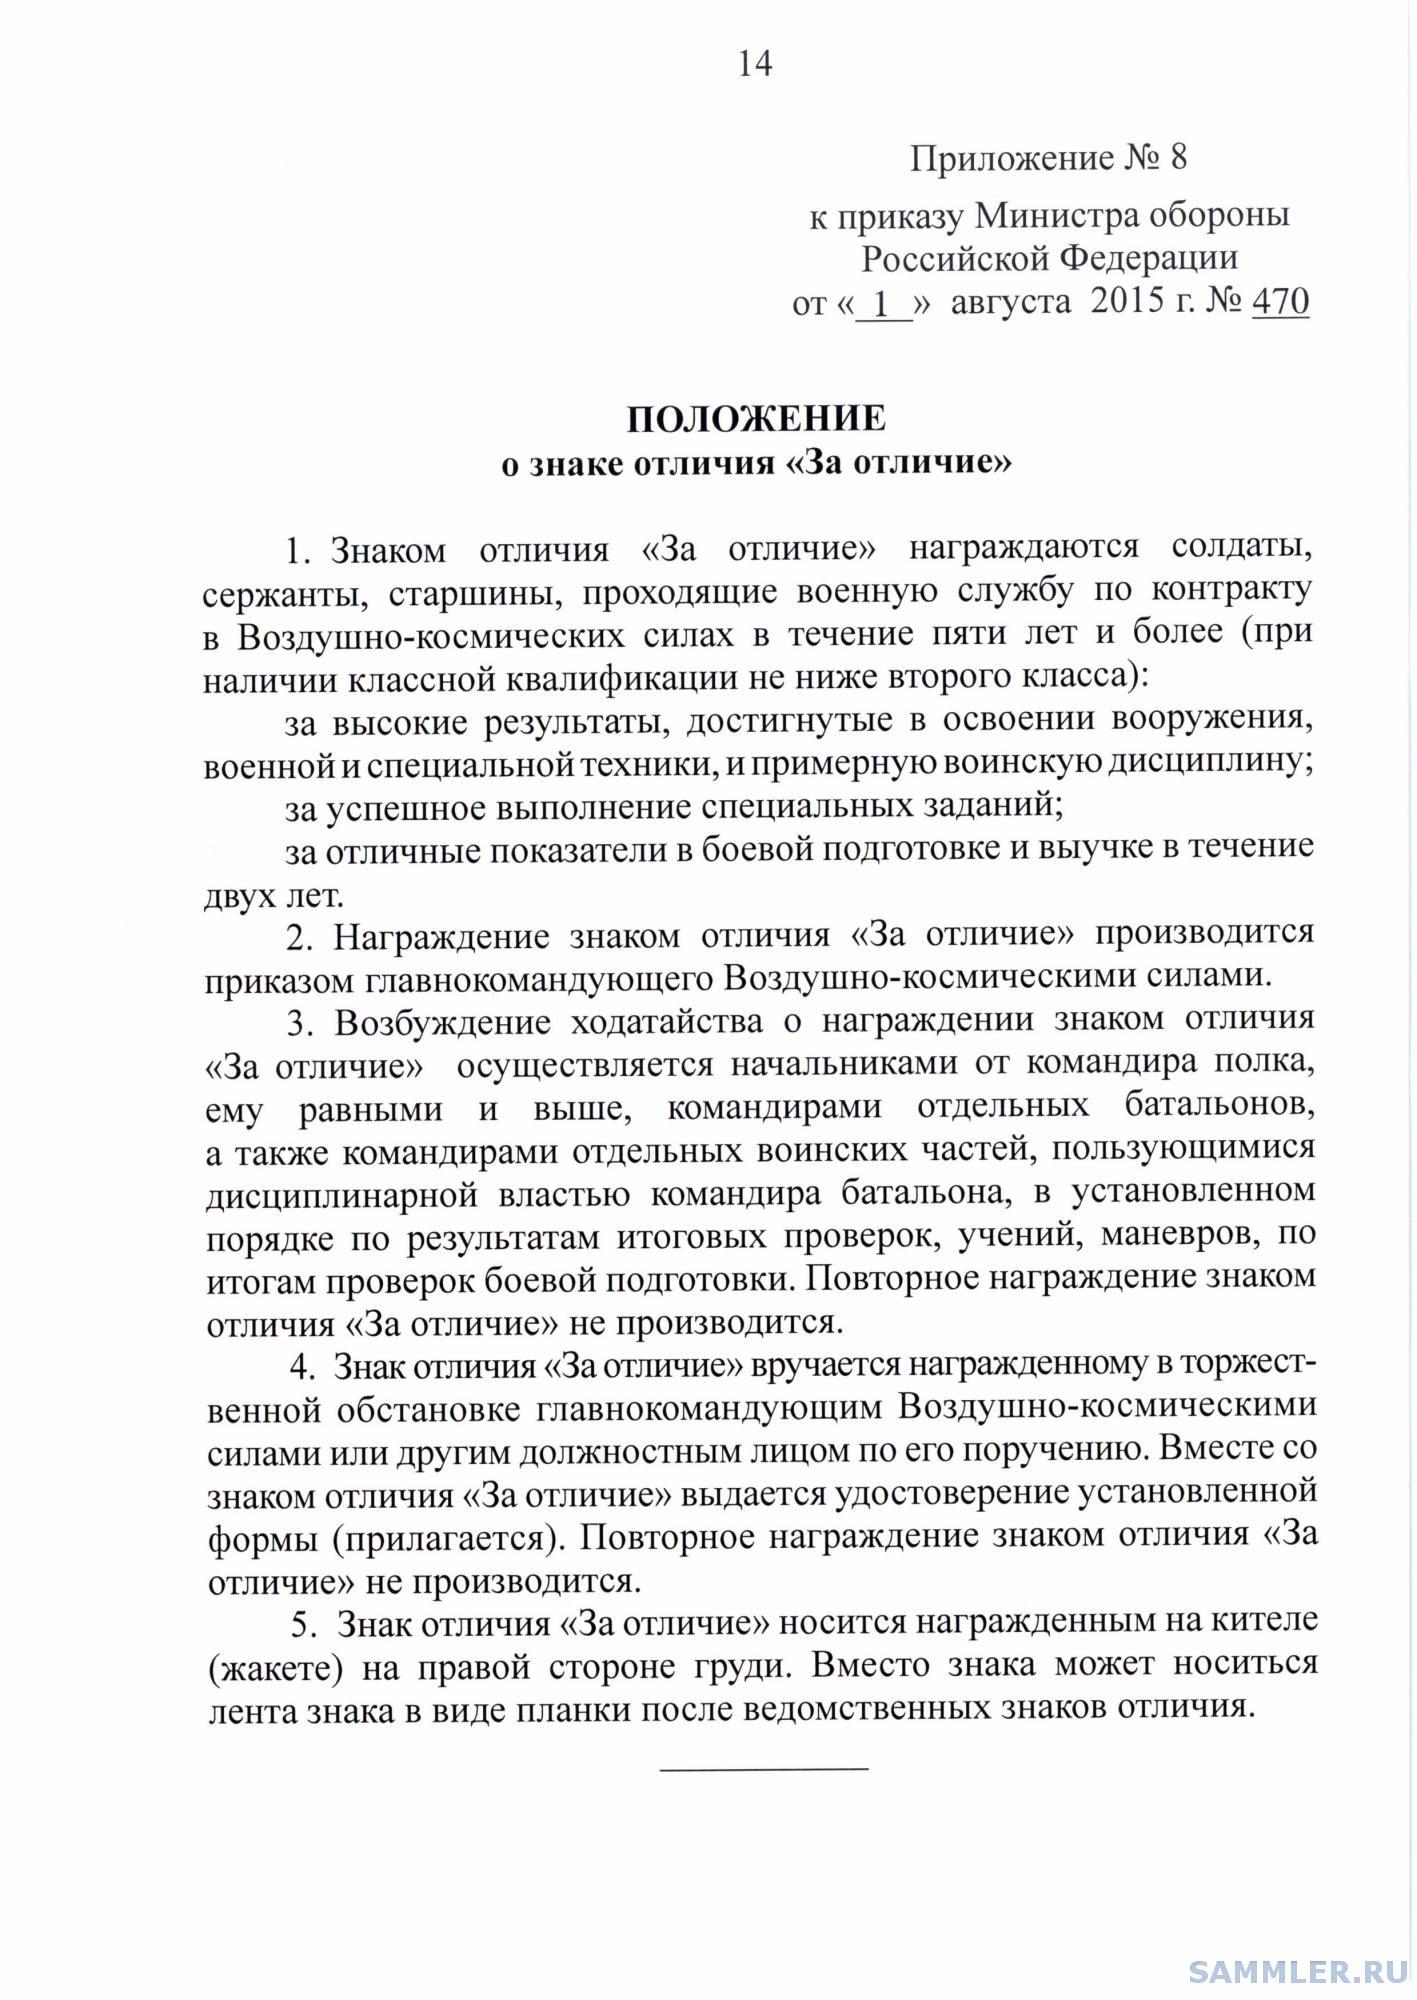 МО РФ 470(цвет)-14.jpg